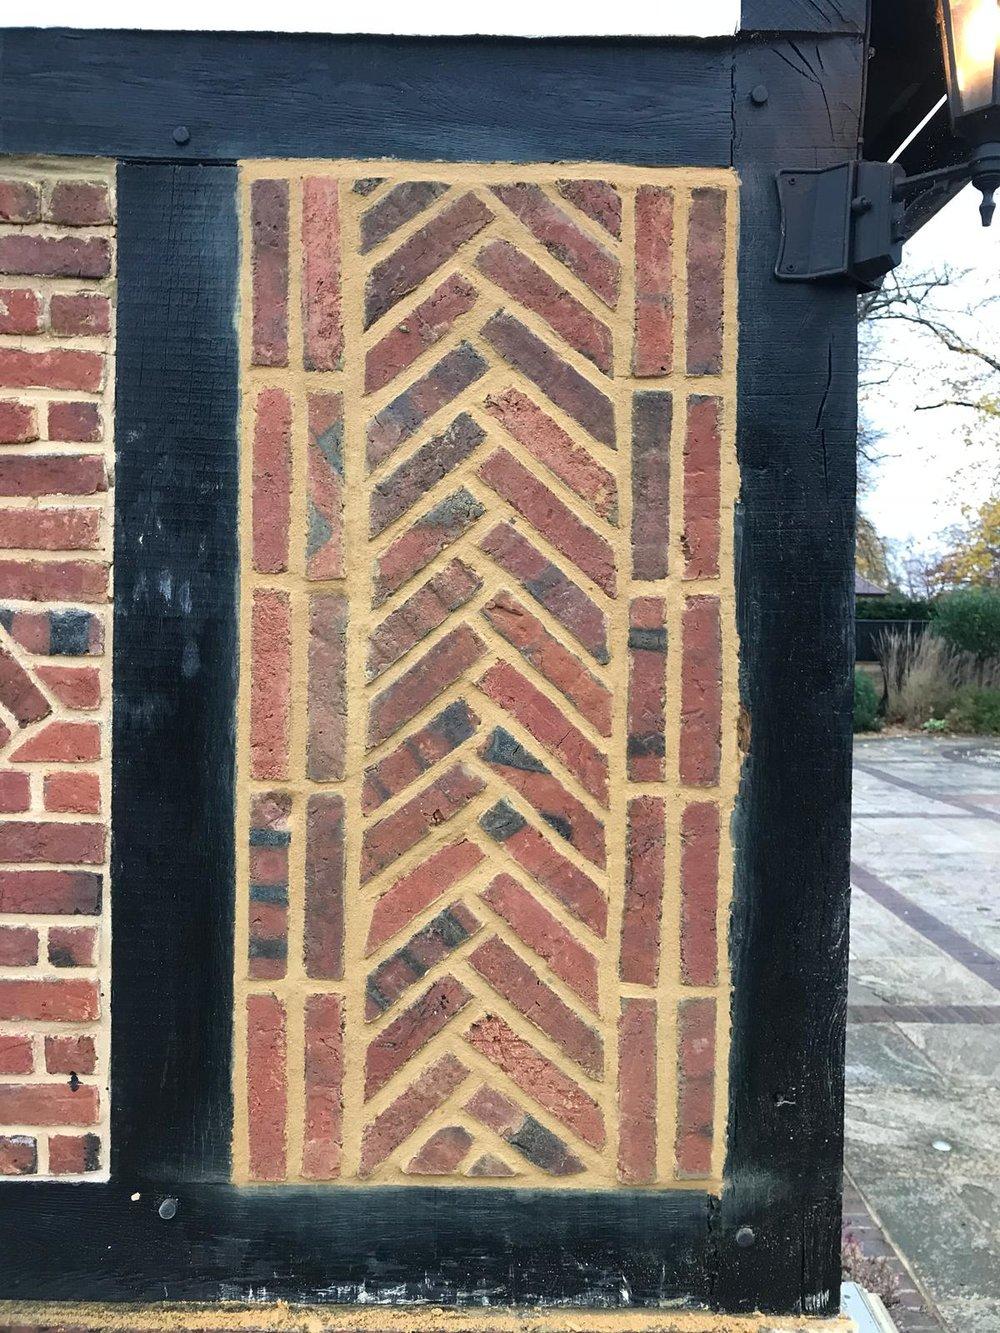 Brick Restoration Project 4 - After